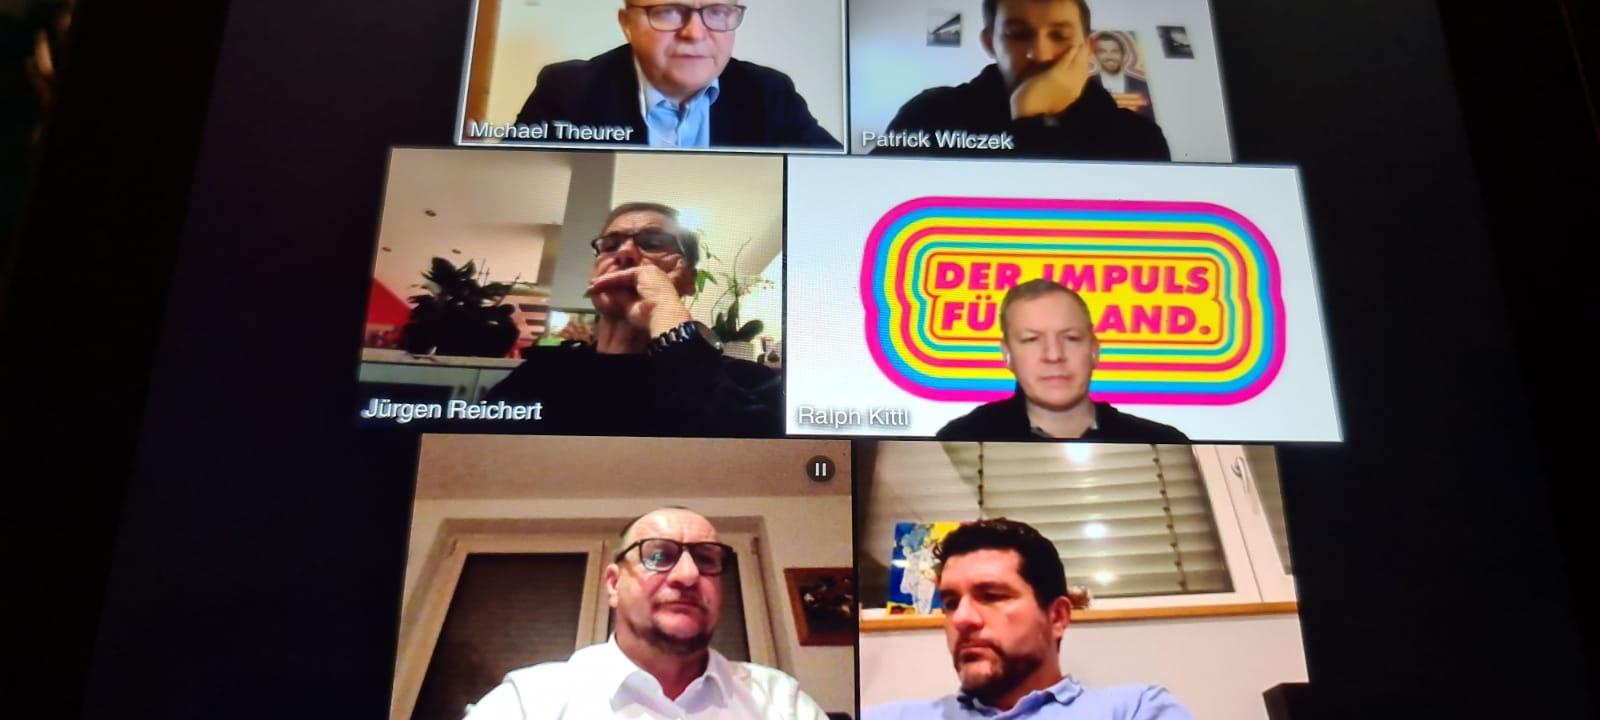 Digitales Kandidatentreffen mit Michael Theurer MdB, Judith Skudelny MdB